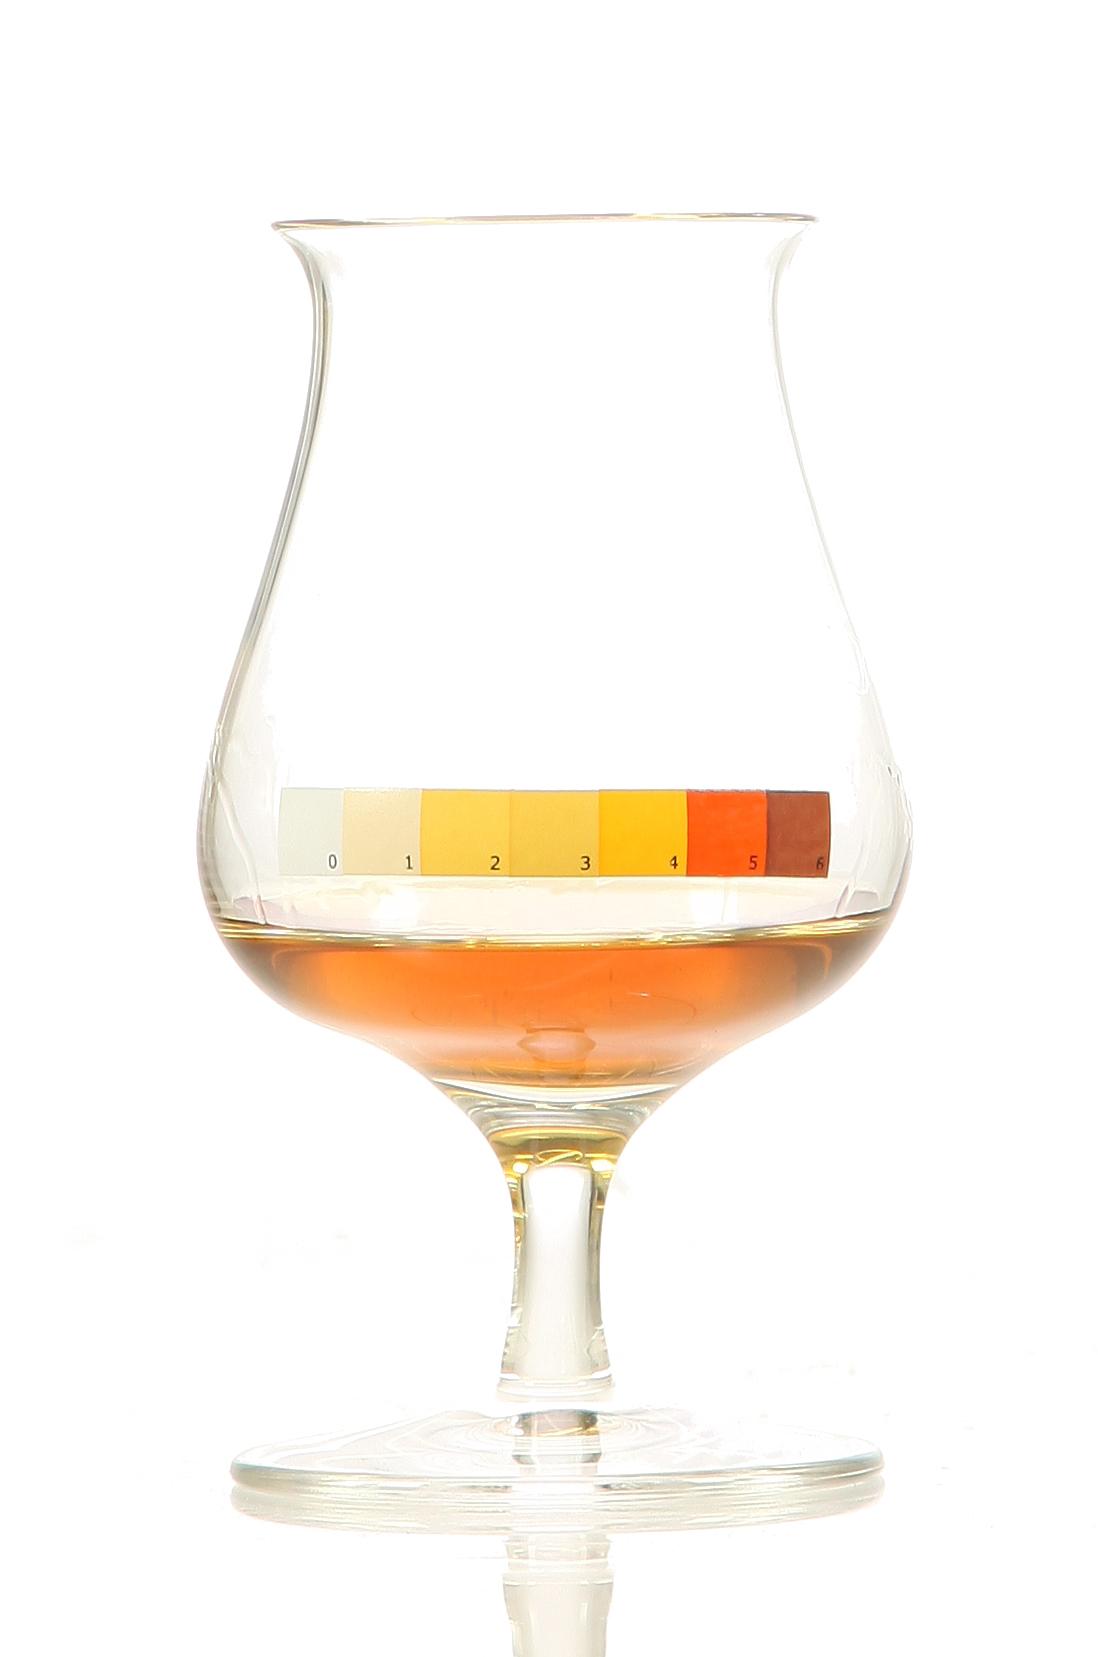 Kristallglas Whisky.de mit Farbskala, einzeln